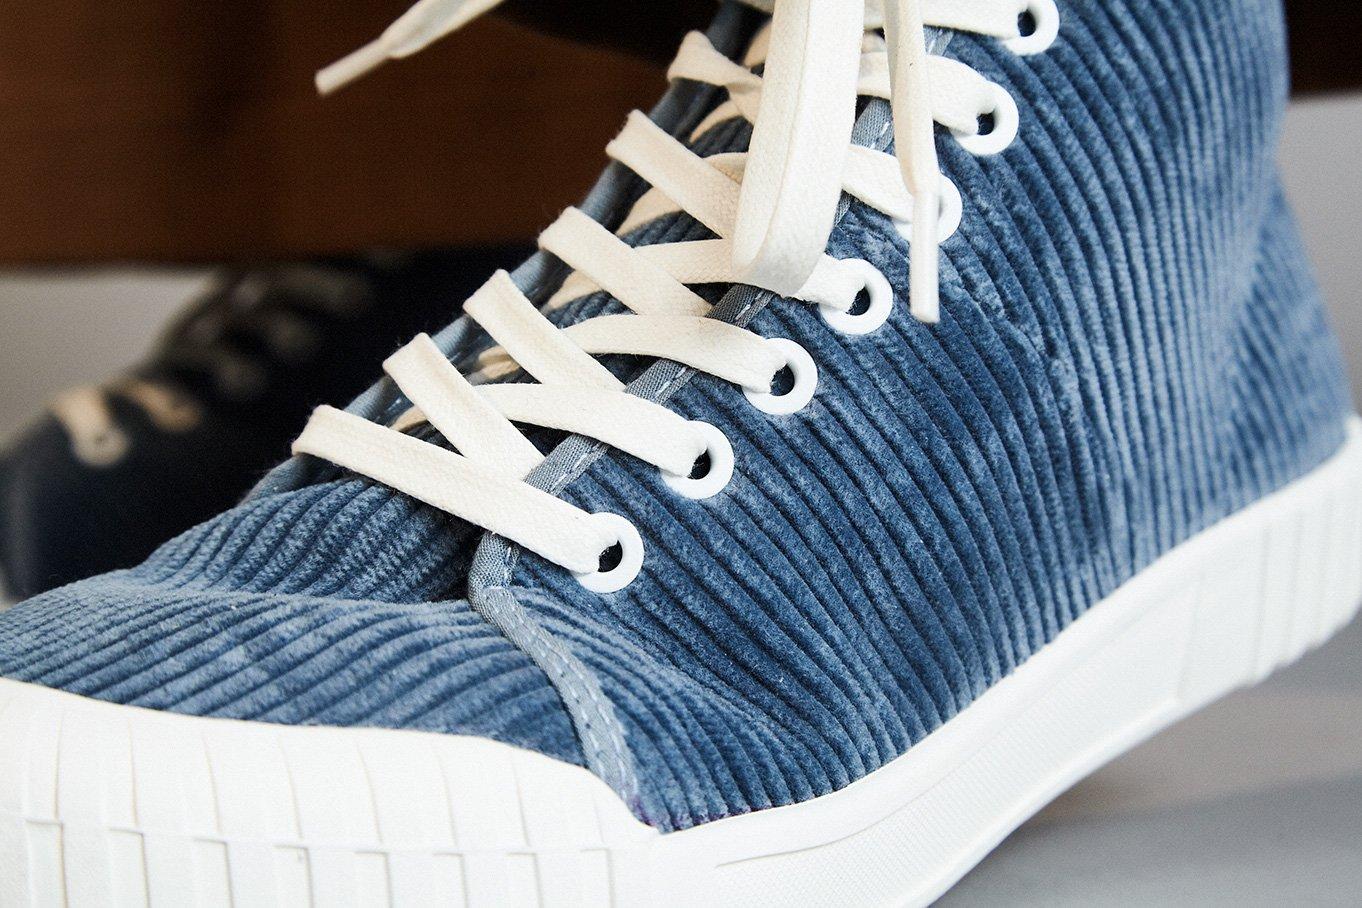 good-news-sneakers-aw17-image-16.jpg